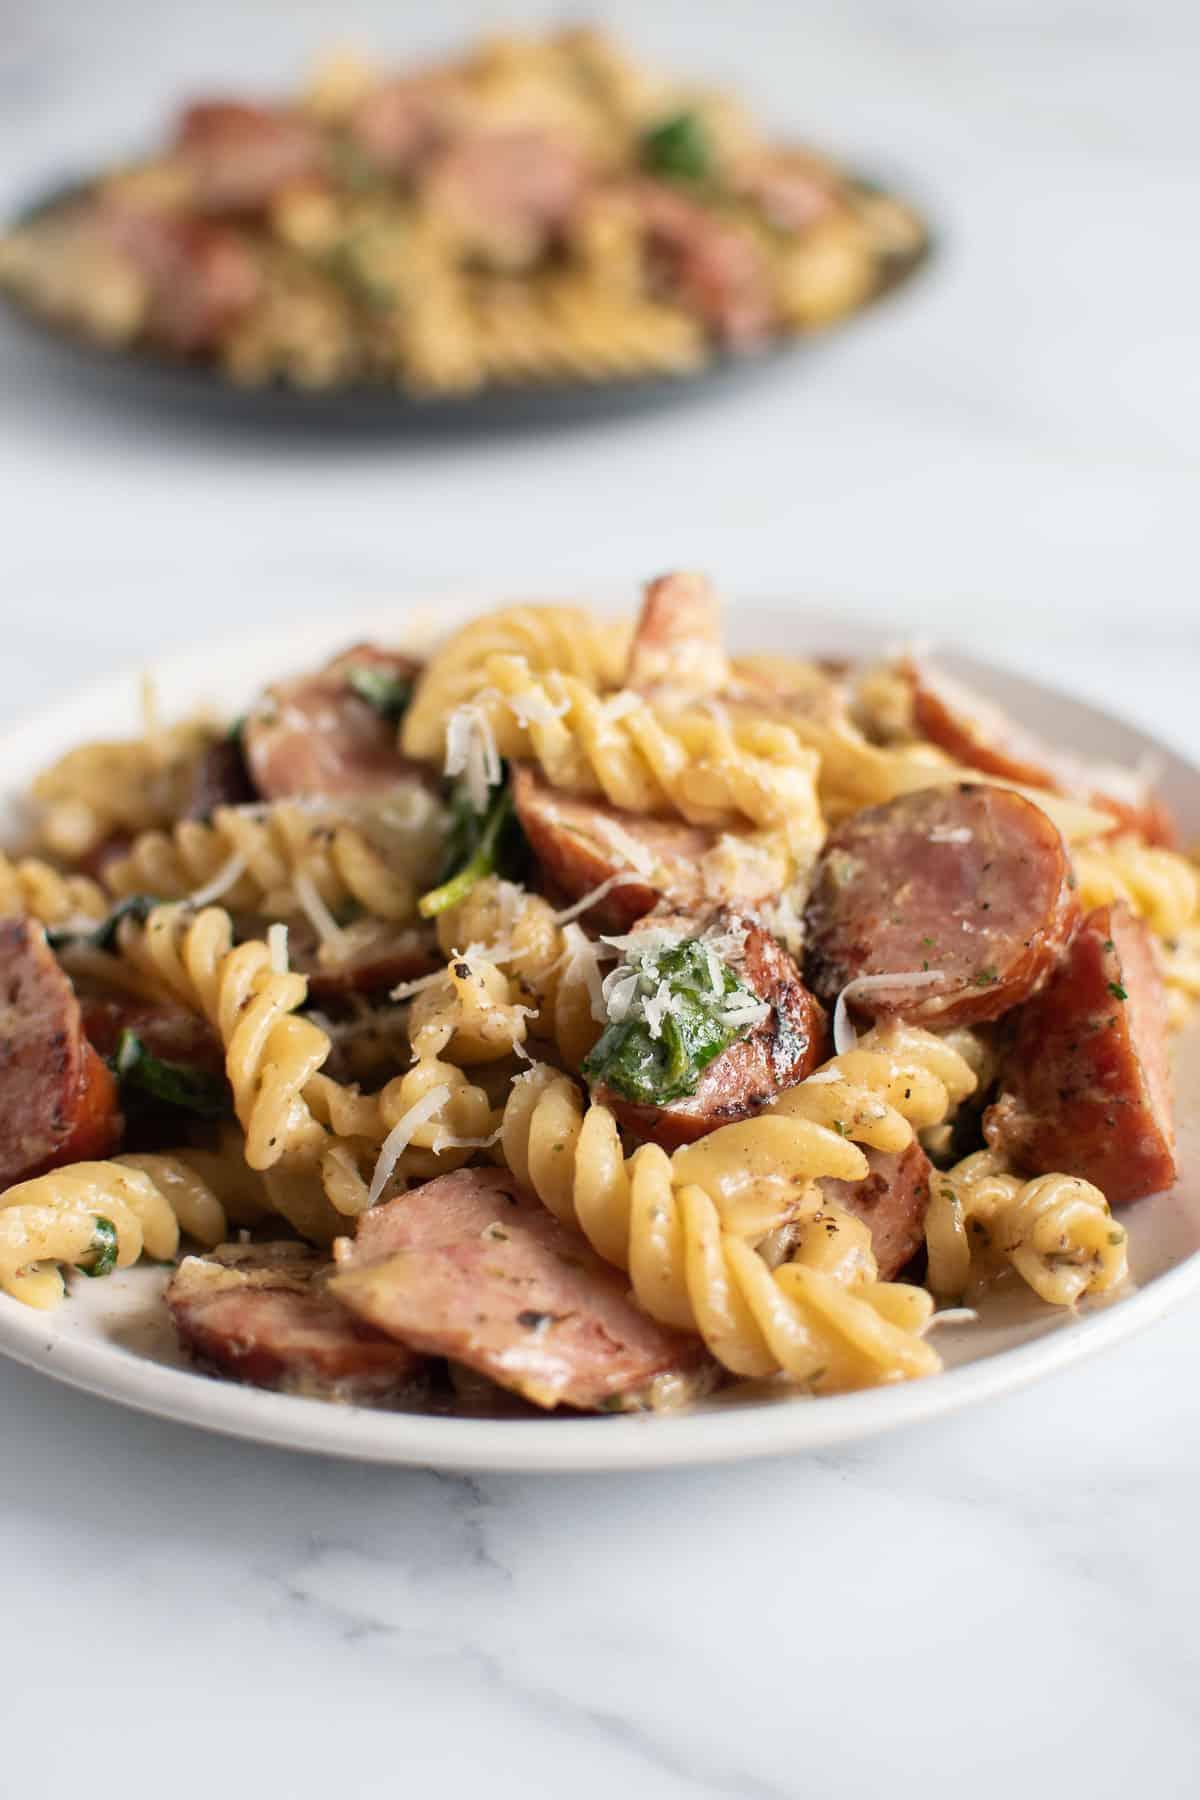 Close up of a plate of kielbasa pasta.